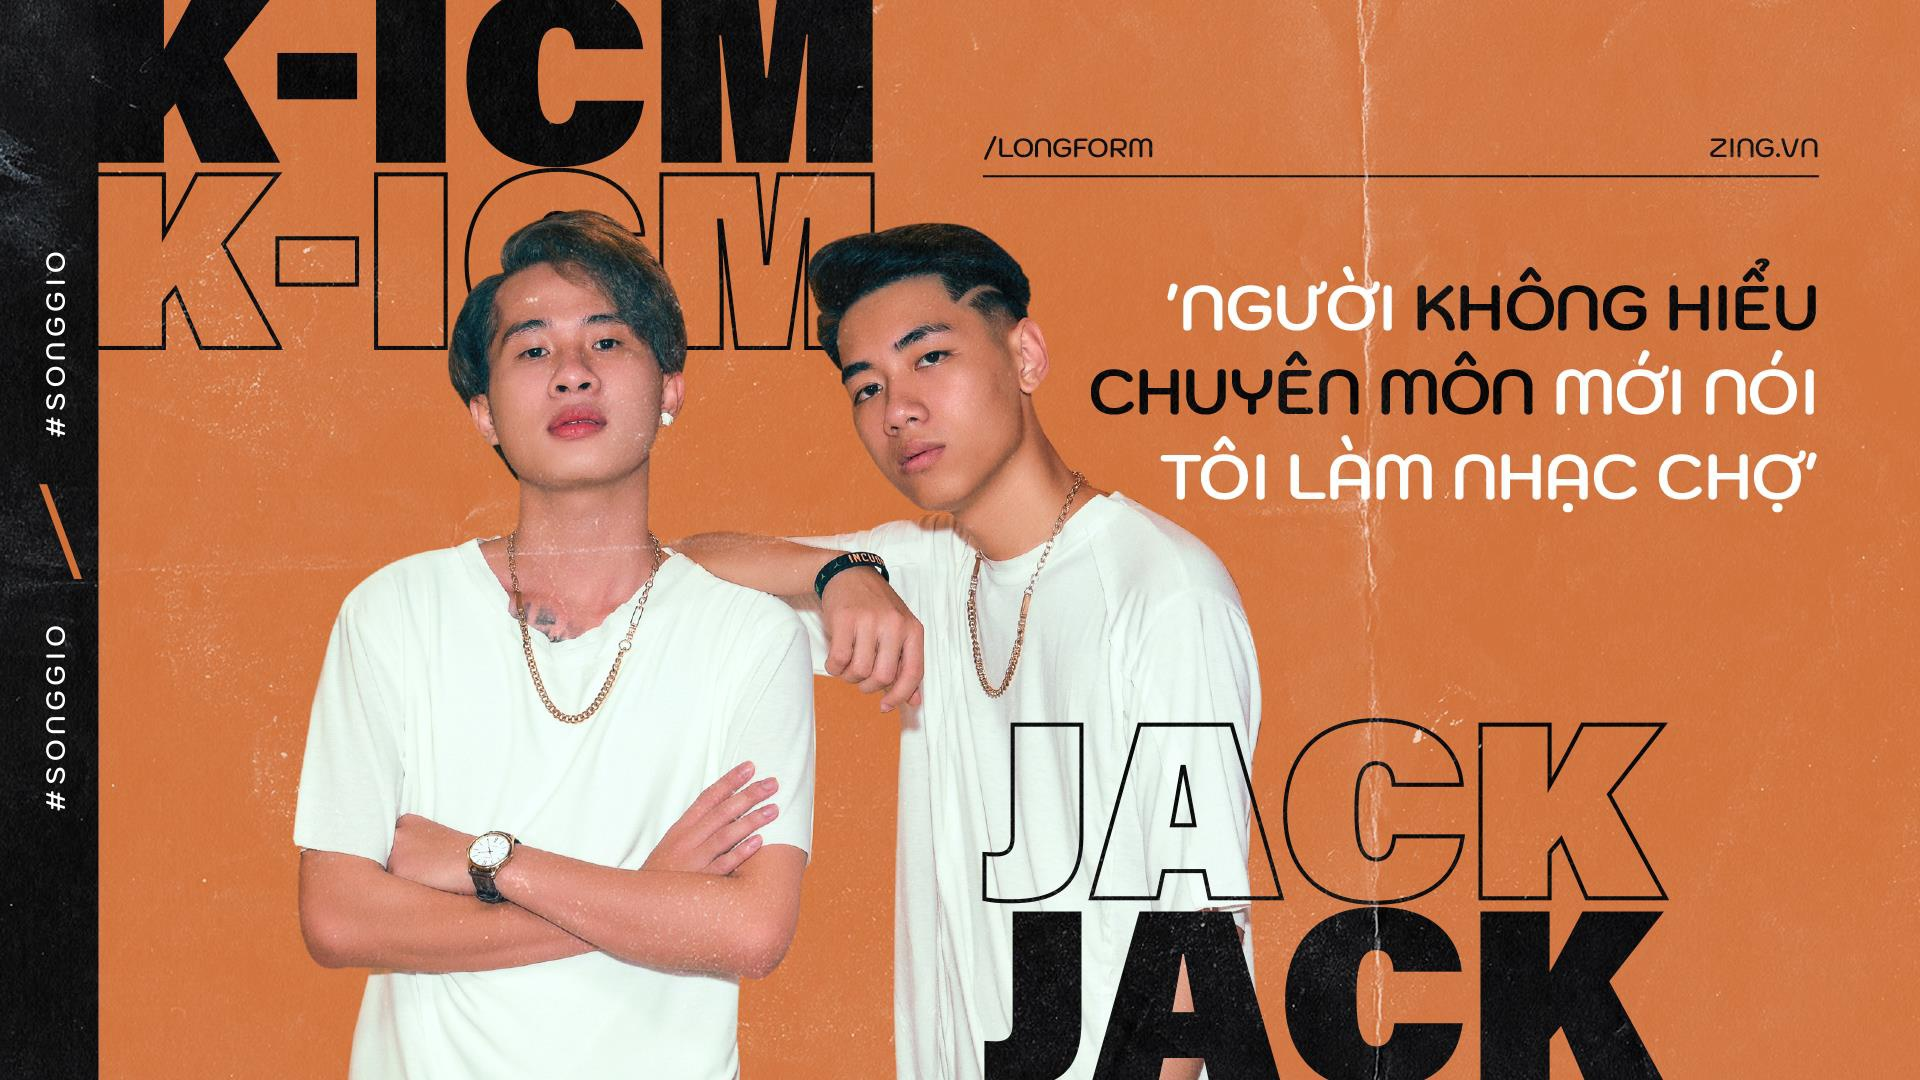 Jack - K-ICM: 'Khong hieu chuyen mon moi noi Song gio la nhac cho' hinh anh 2